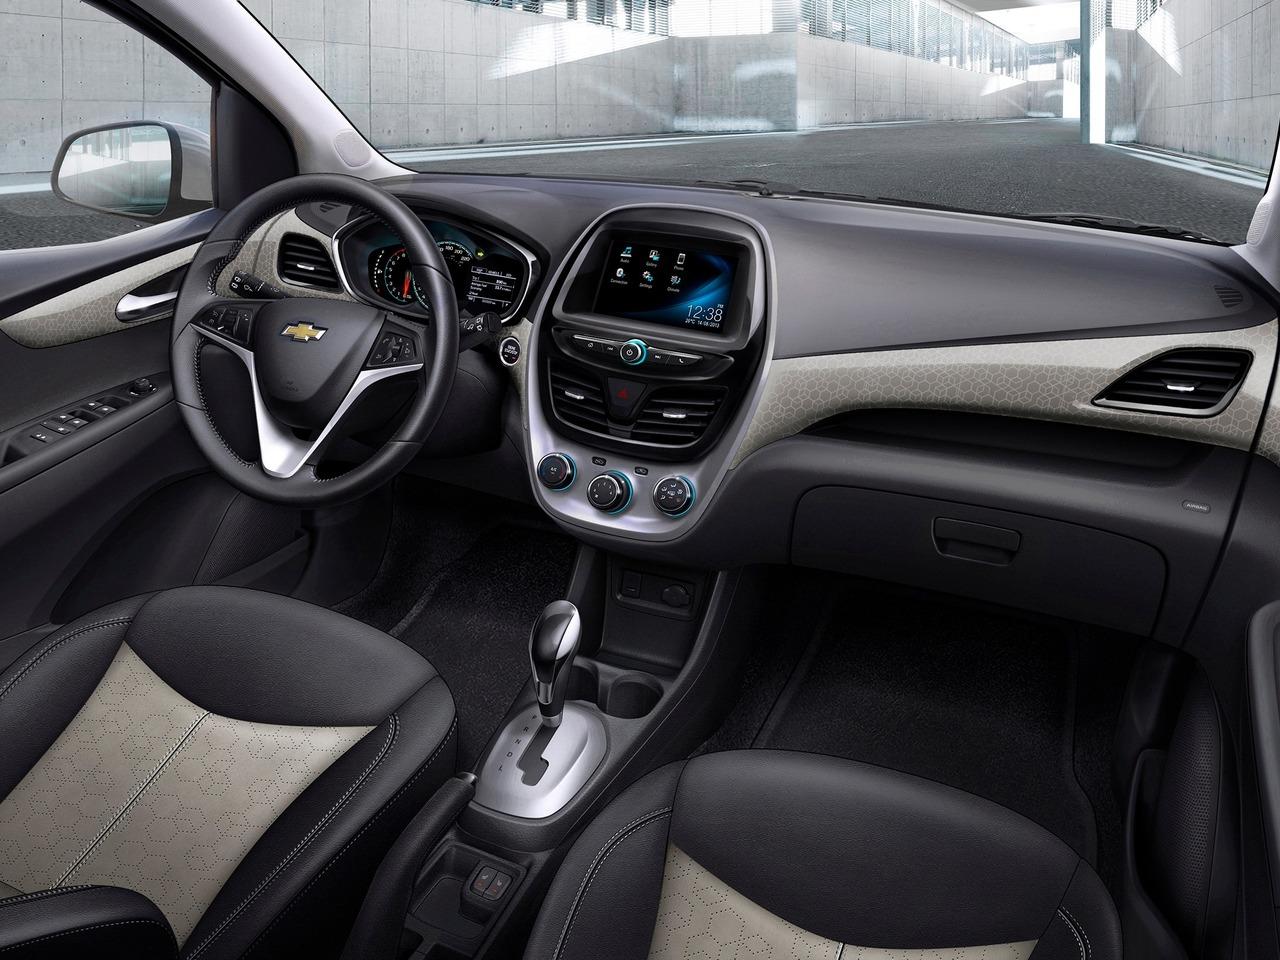 Снимки: Chevrolet Spark 2015